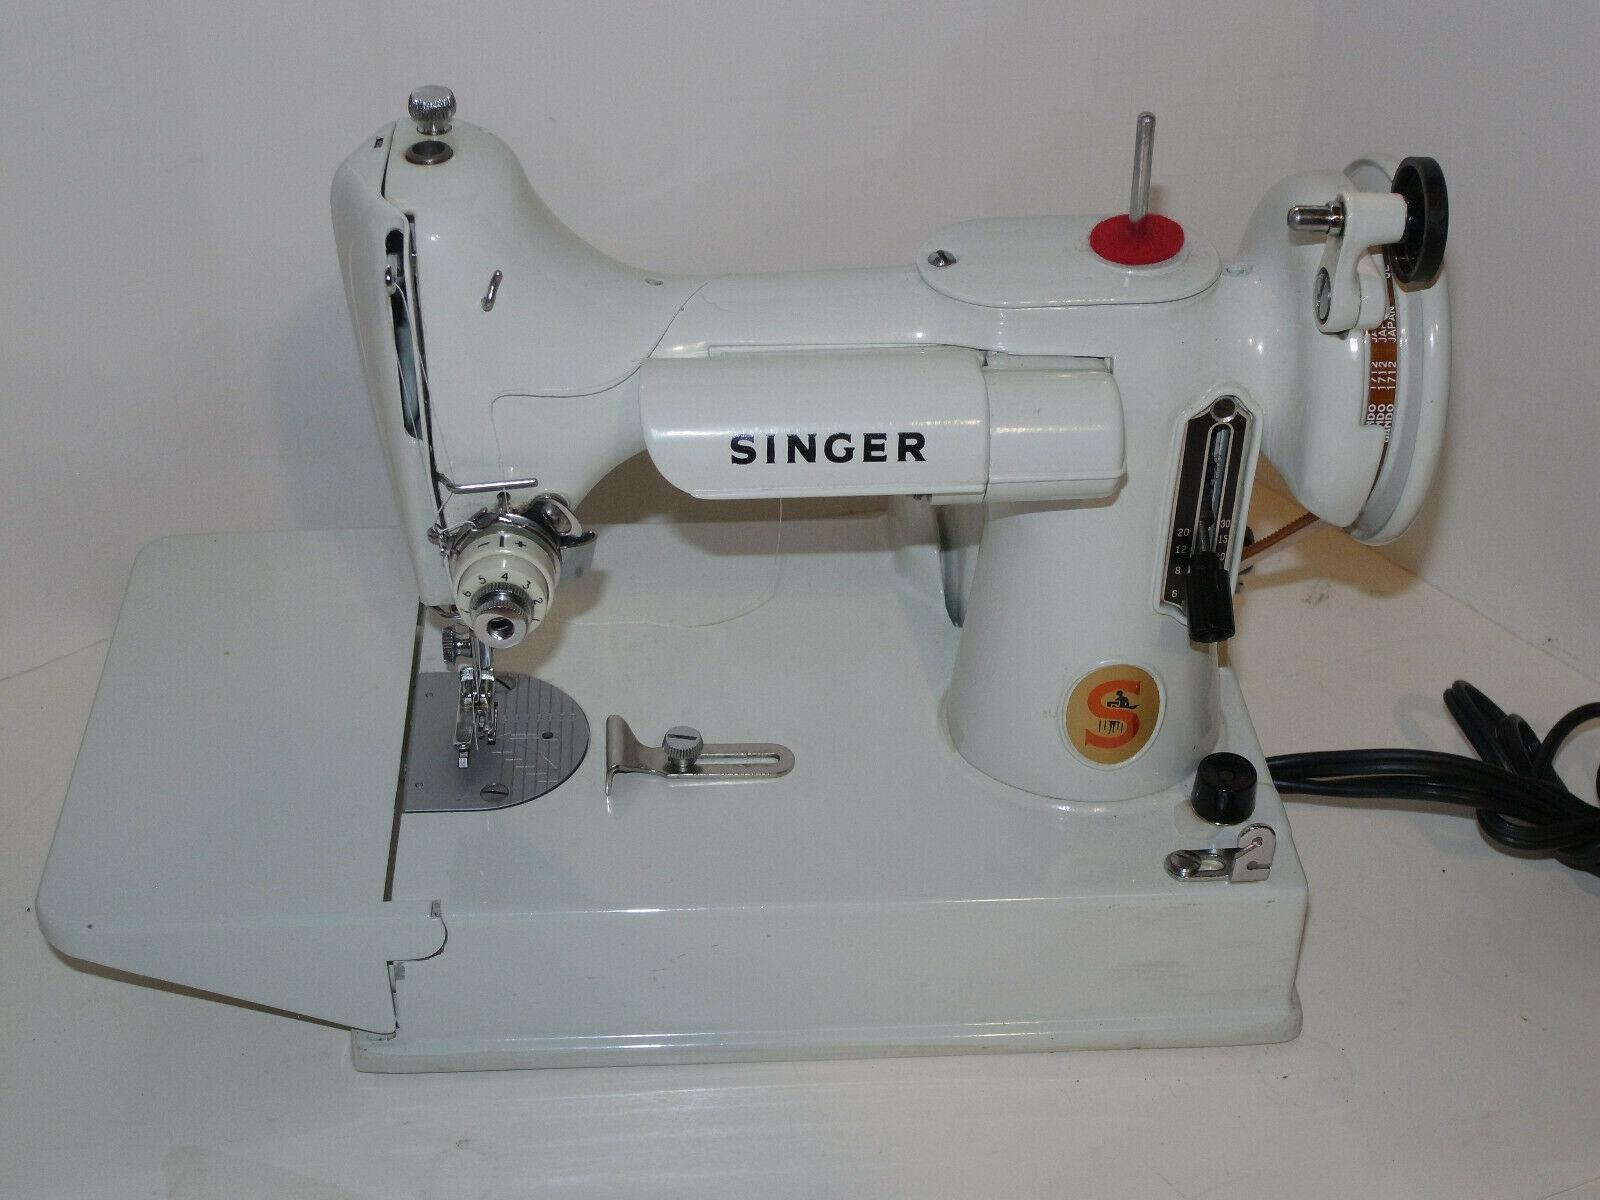 1960s sewing machine